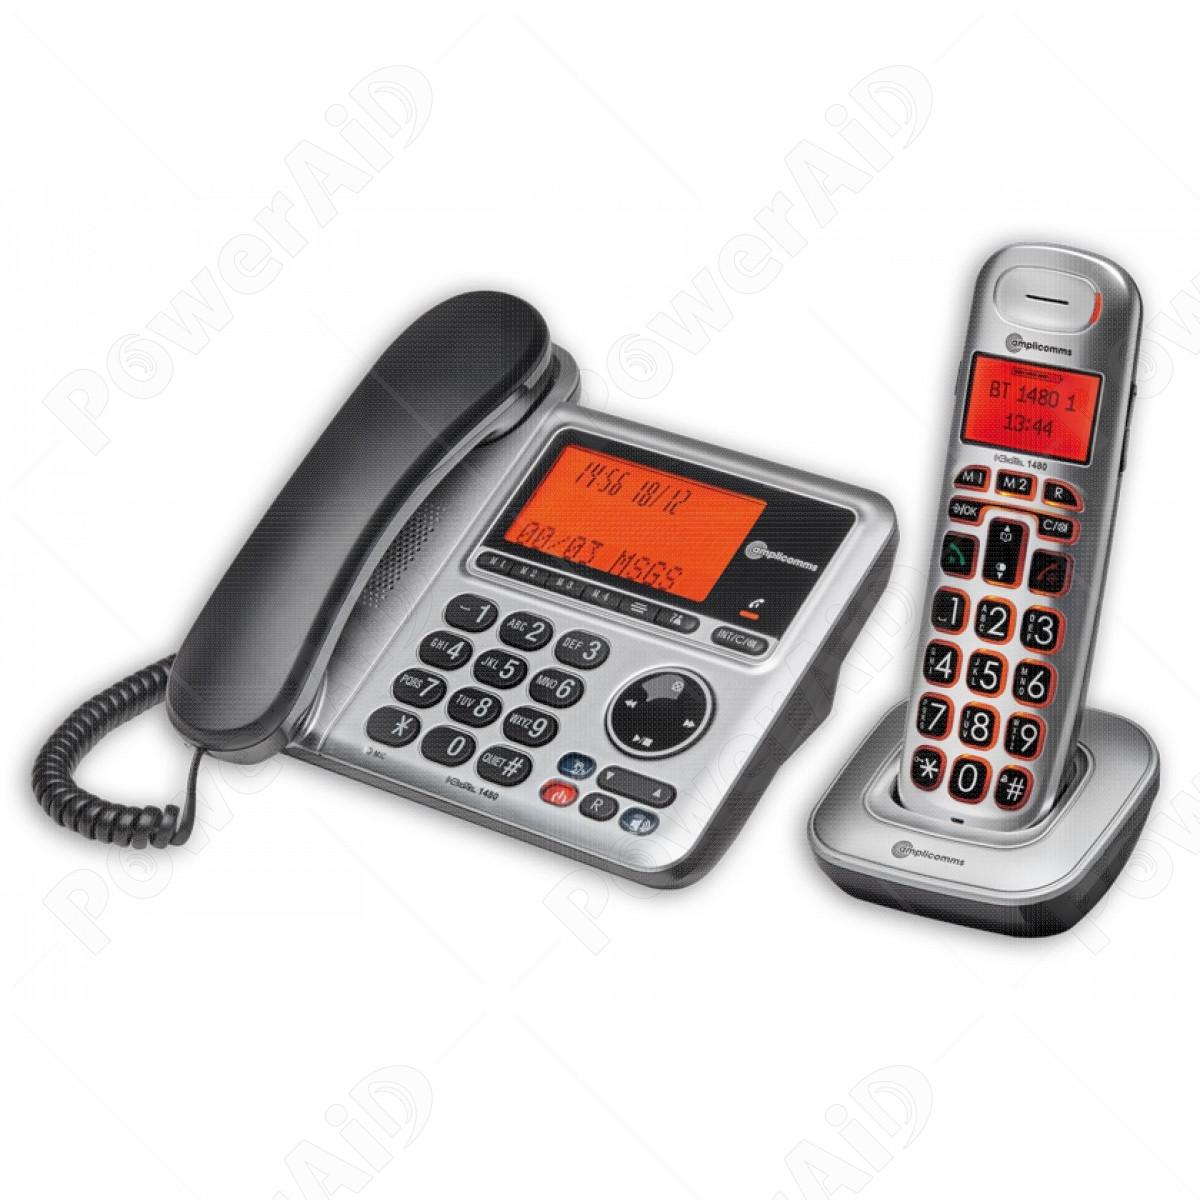 Amplicomms - BigTel 1480 telefono combo